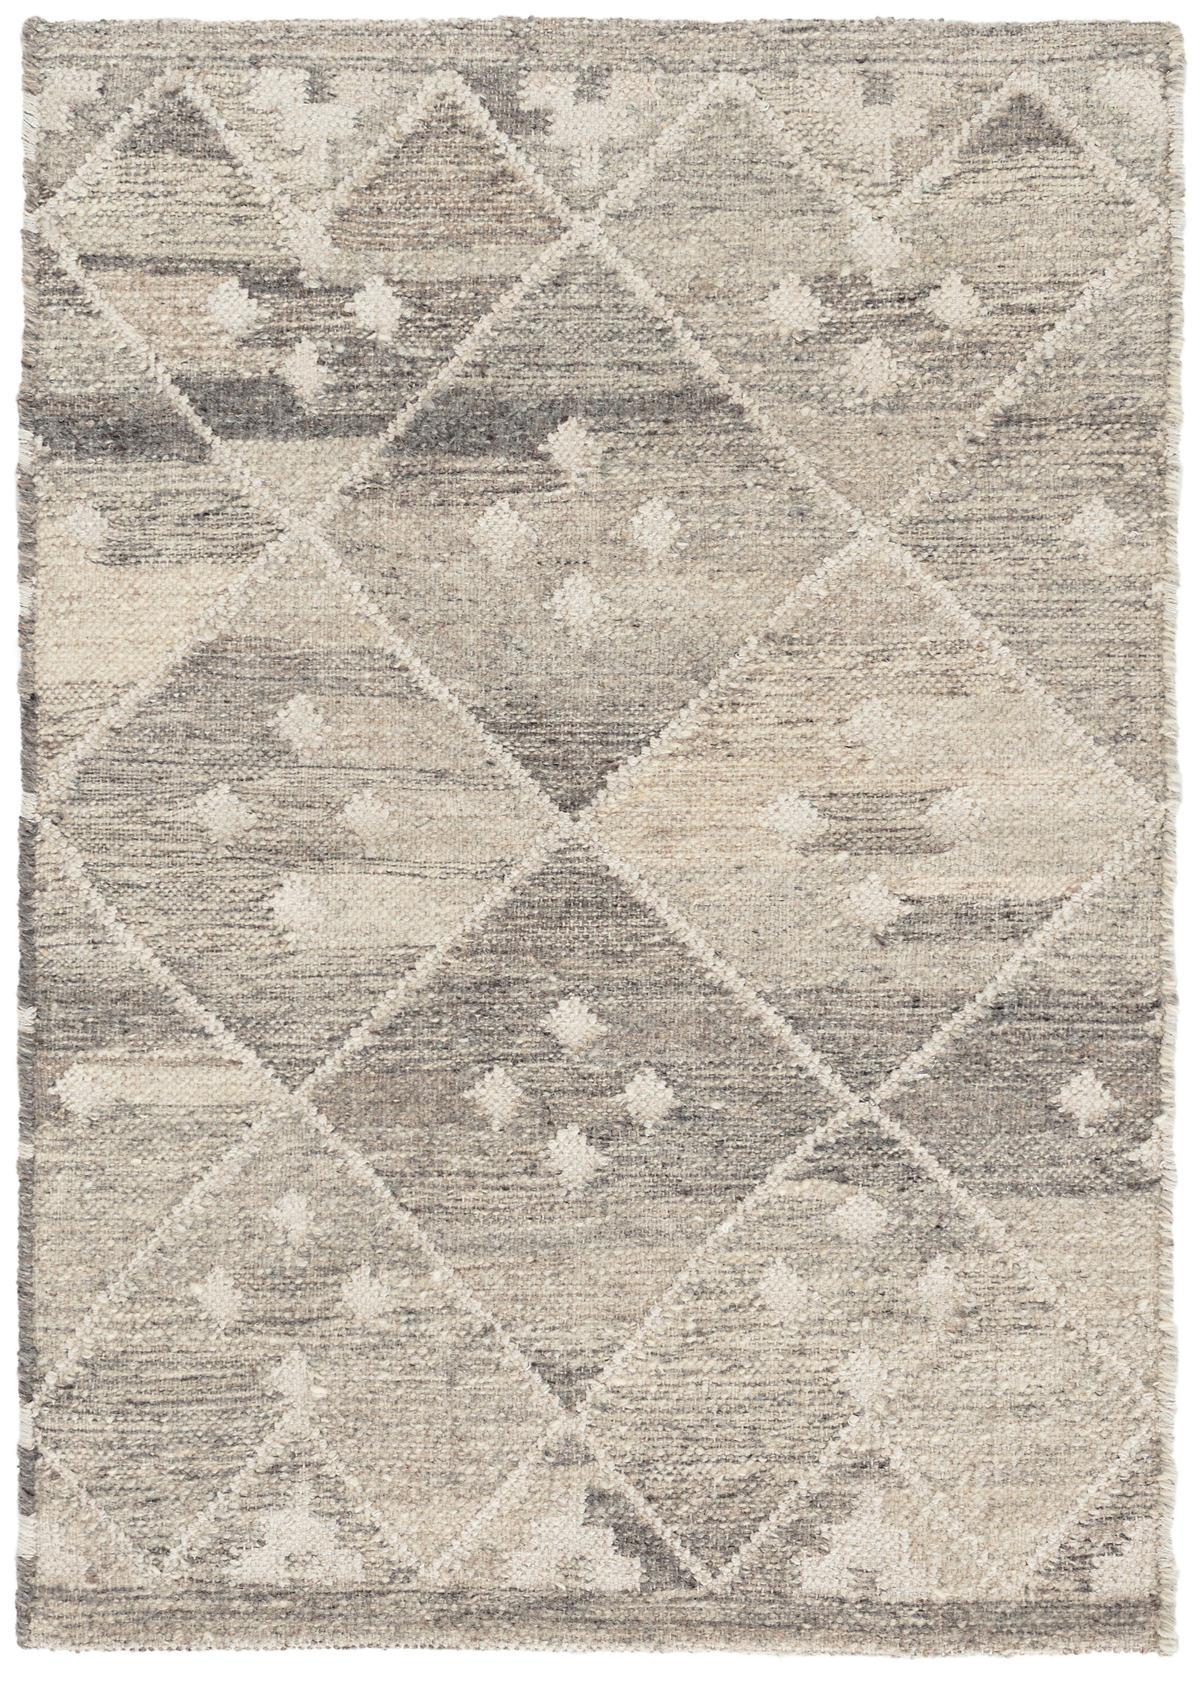 Kota Natural Woven Wool Rug